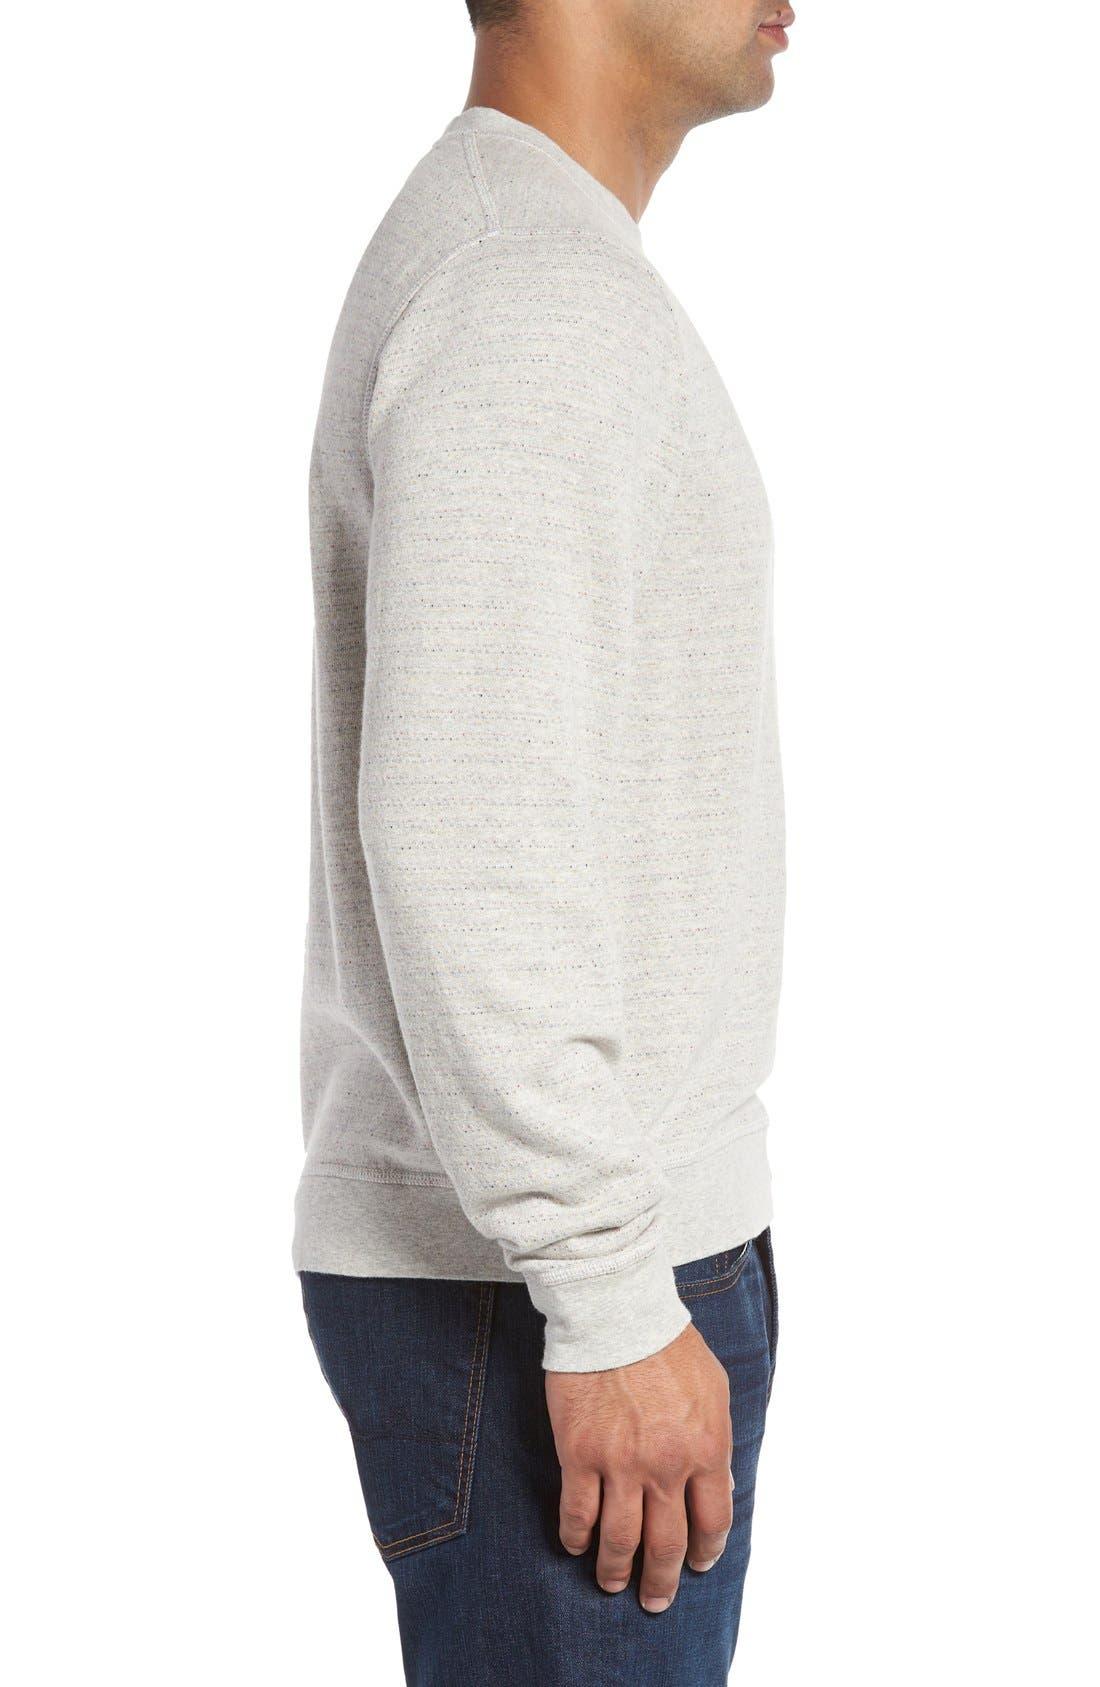 'Gleann' French Terry Crewneck Sweatshirt,                             Alternate thumbnail 2, color,                             250